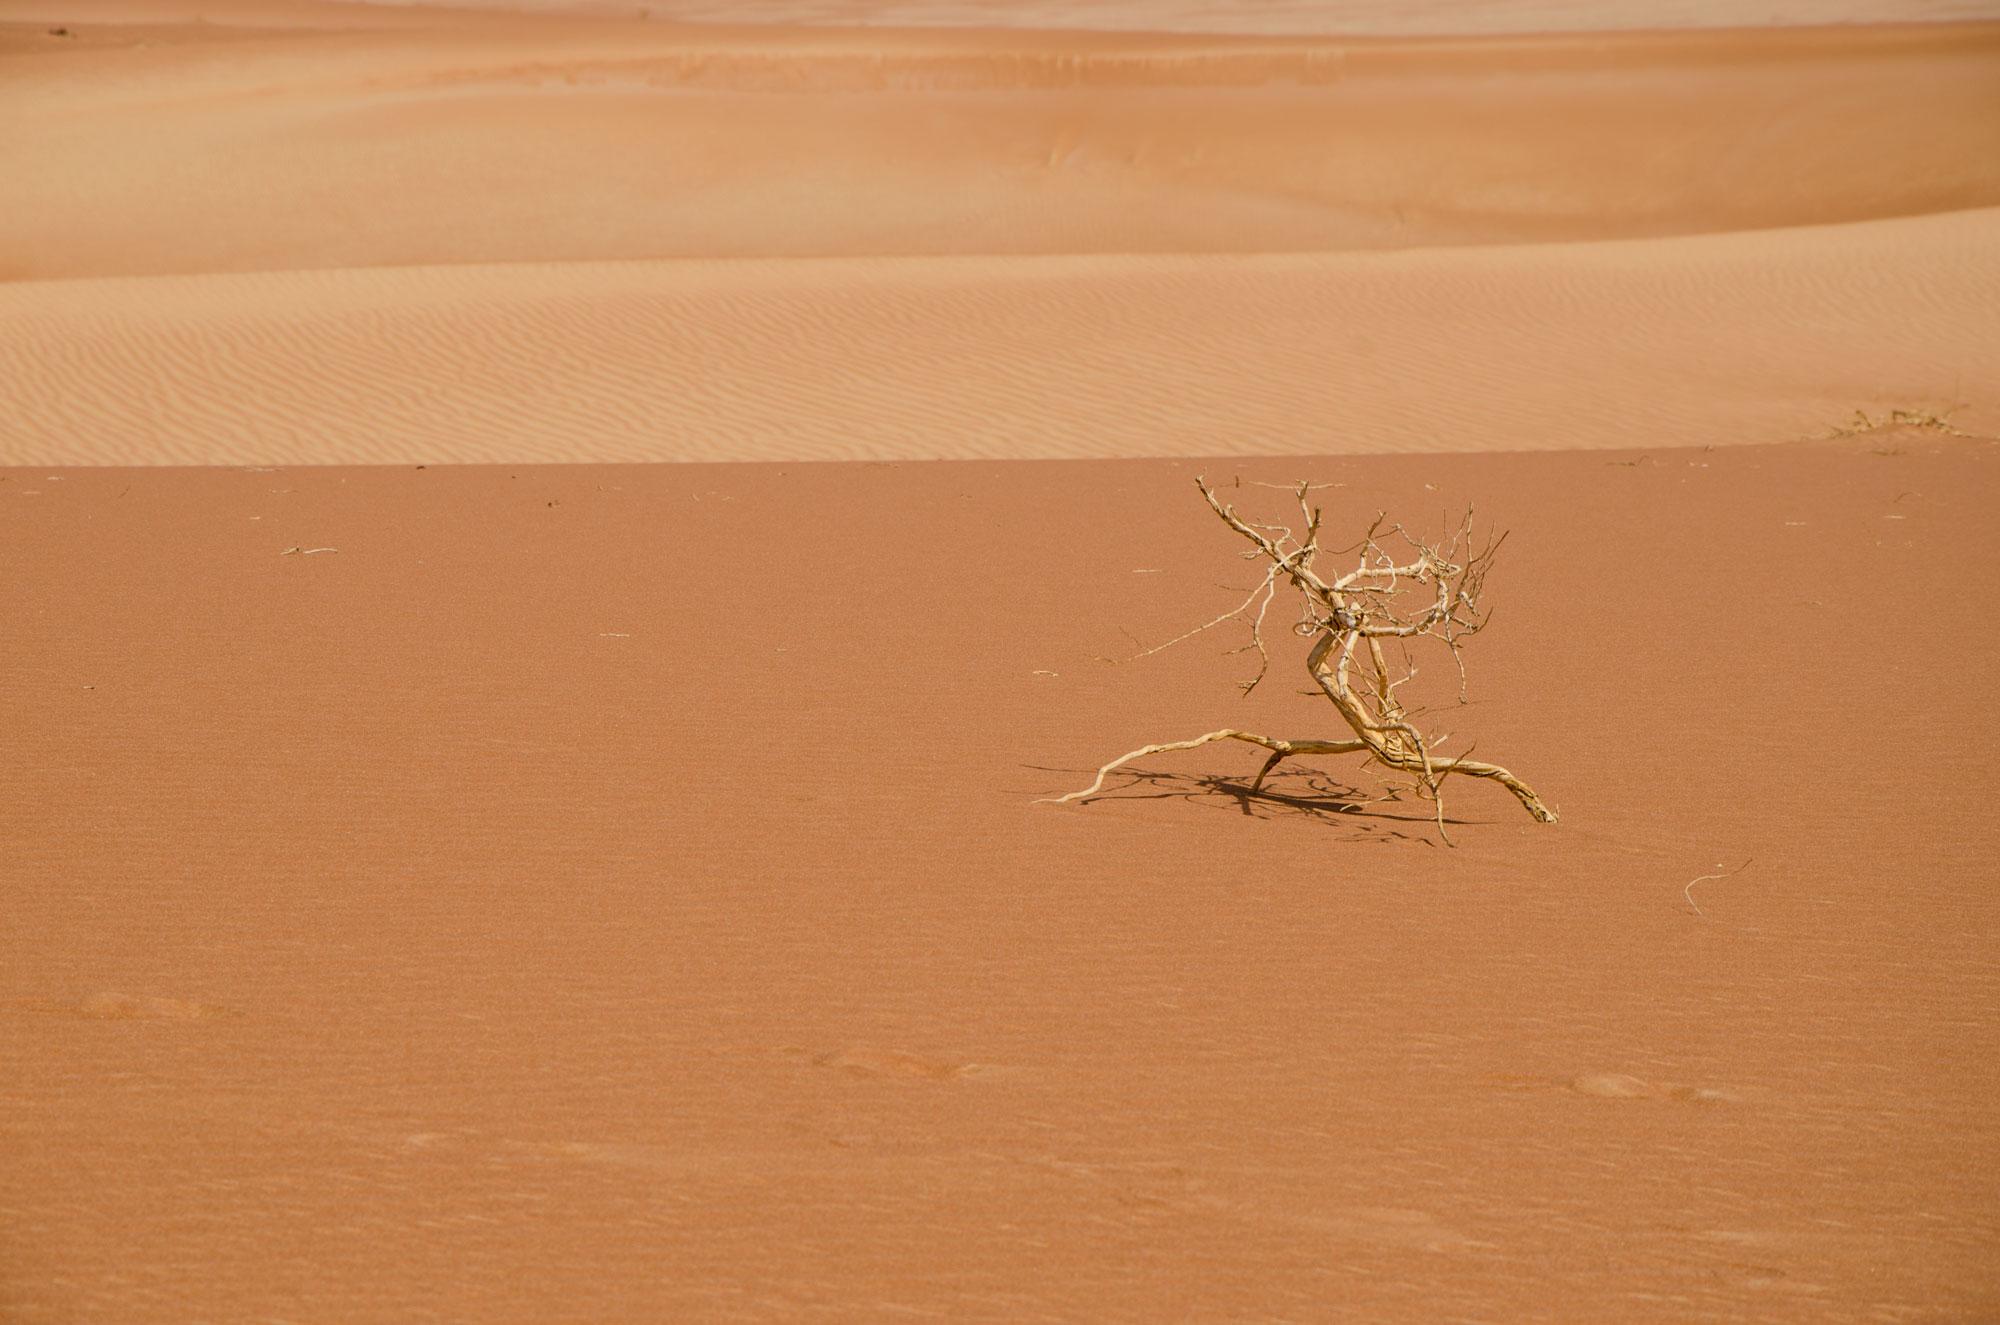 Vertrockneter Ast im Wüstensand. Foto: Lothar Ruttner